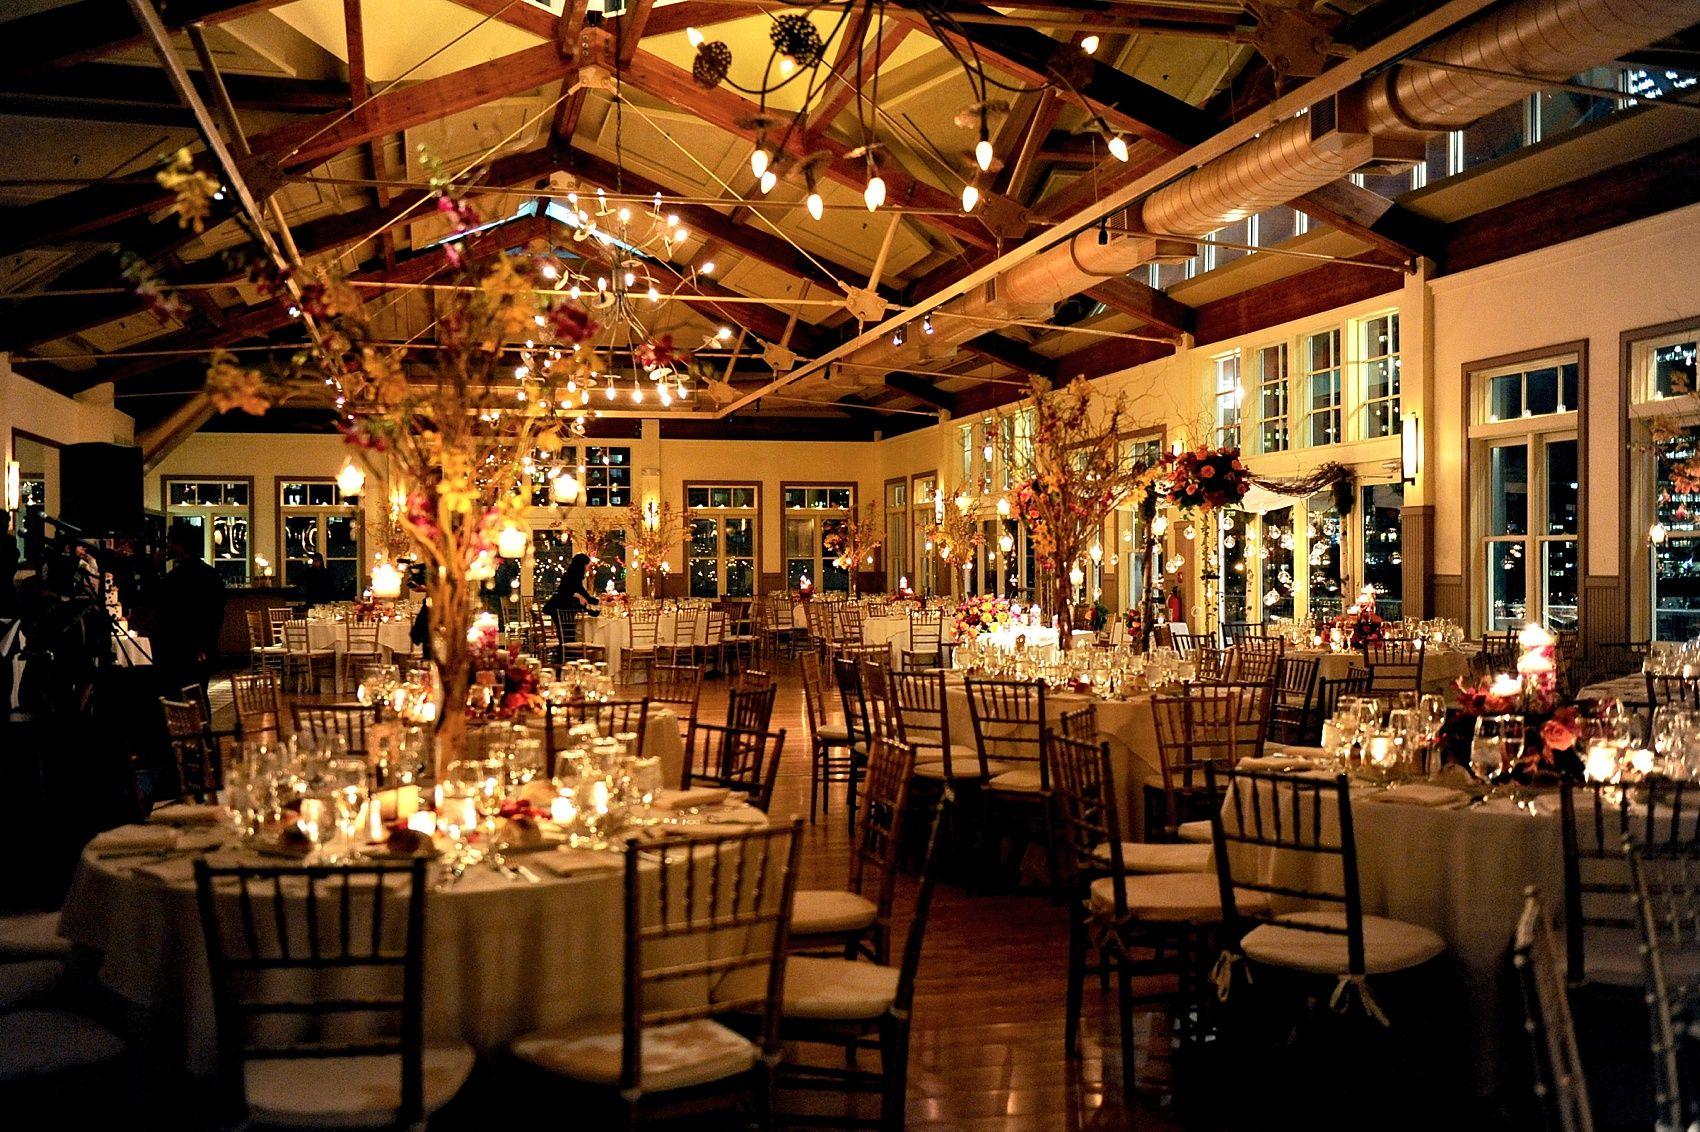 Liberty House Wedding Photos Nyc Skyline Throwback Thursday Kristen And Leor S Wedding Rale Liberty House Wedding Styles Themes Tall Flower Arrangements